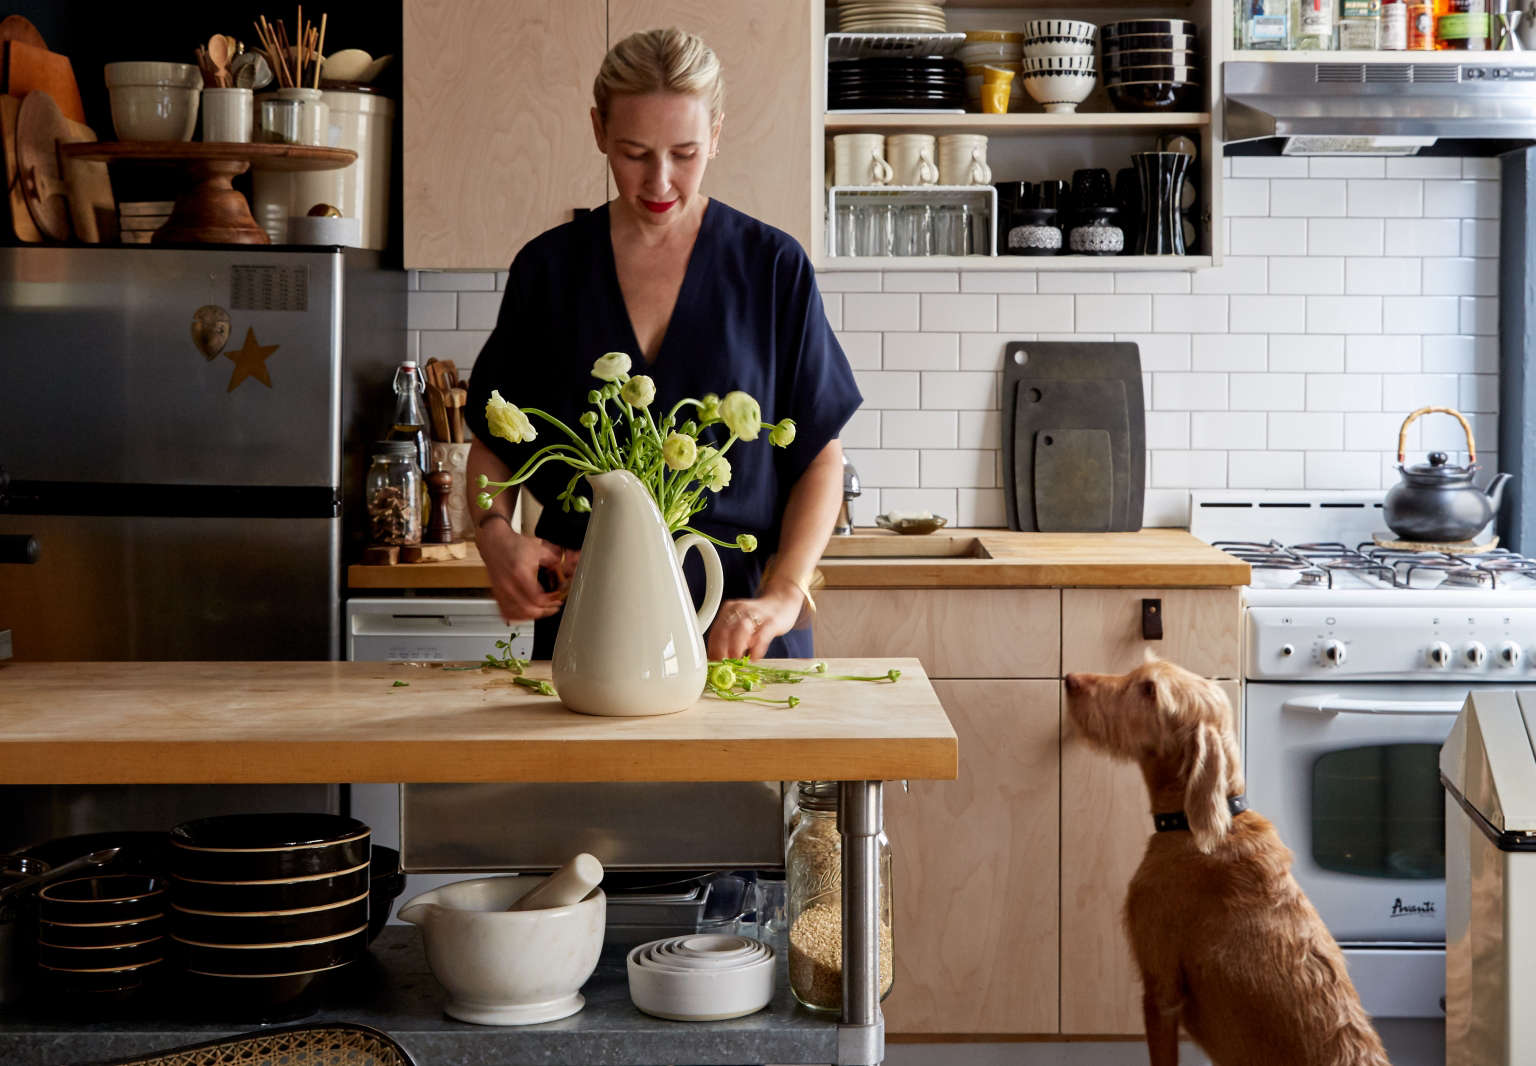 Renata Bokalo at home in her DIY kitchen remodel in her NYC rental, Kate Sears photo